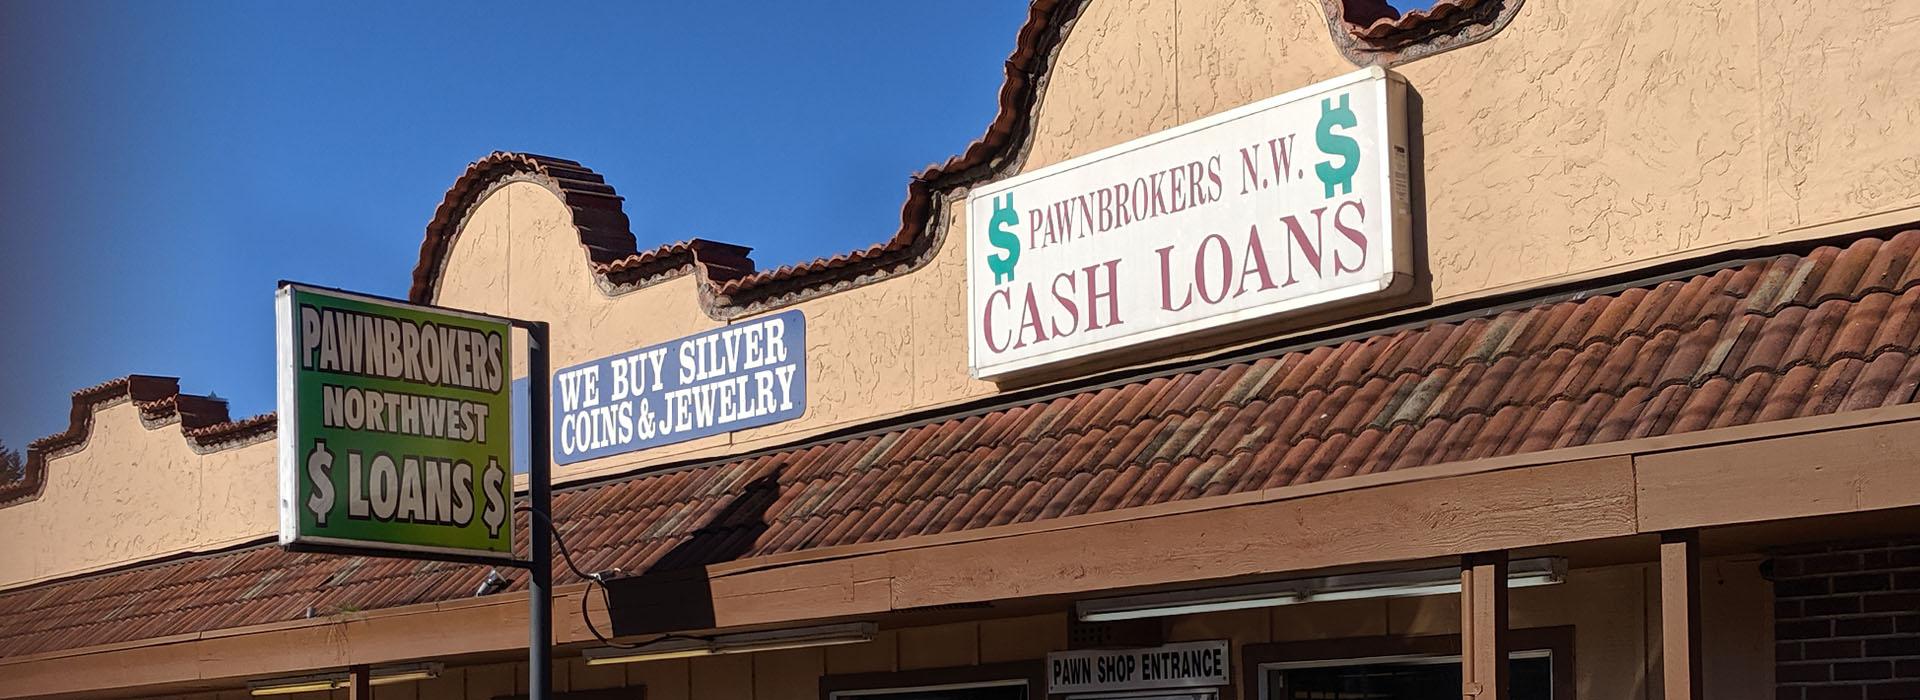 Pawnbrokers Northwest